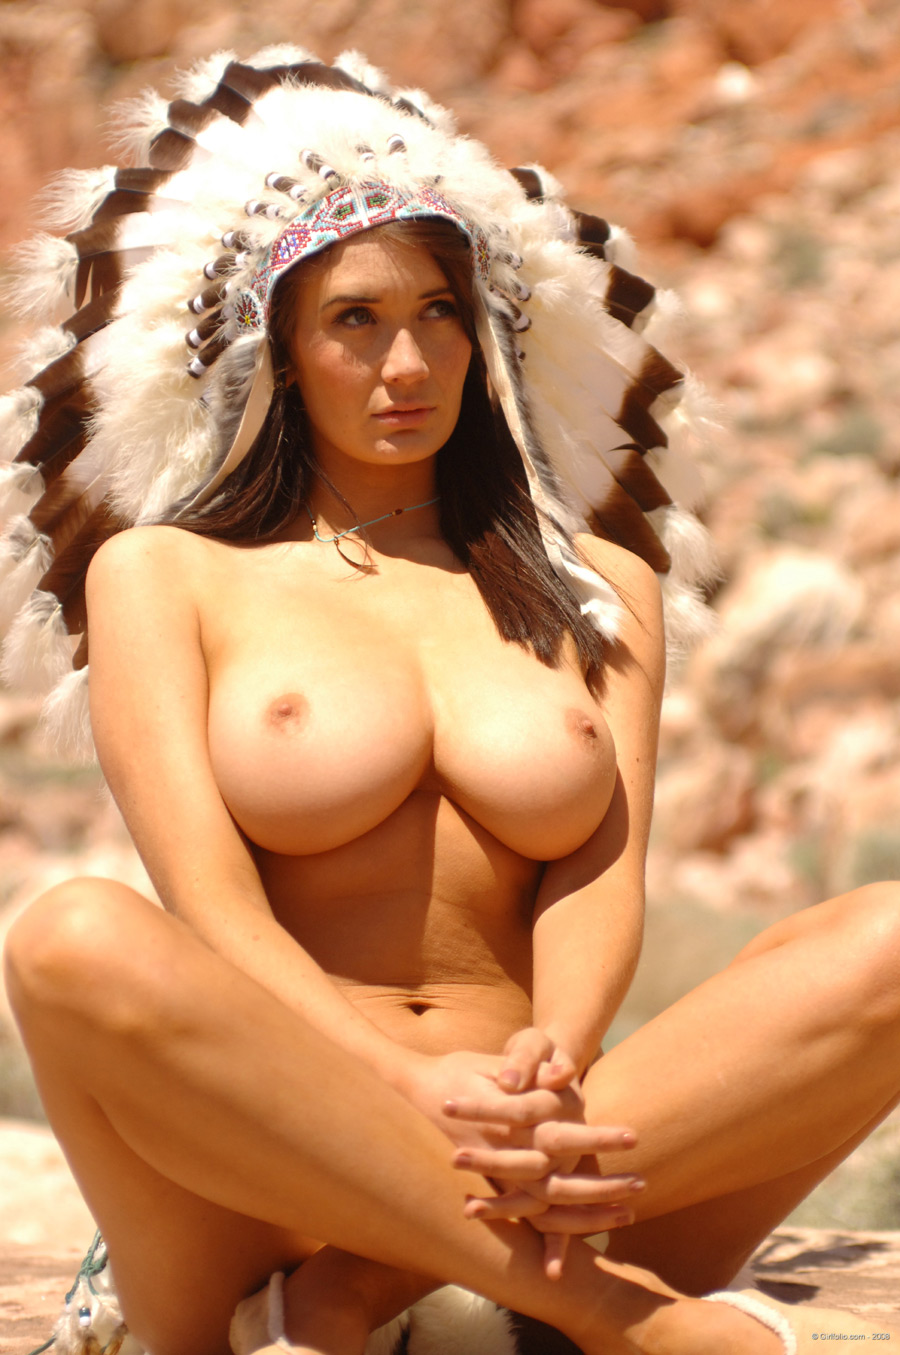 Native american female indian porn stars hot pics